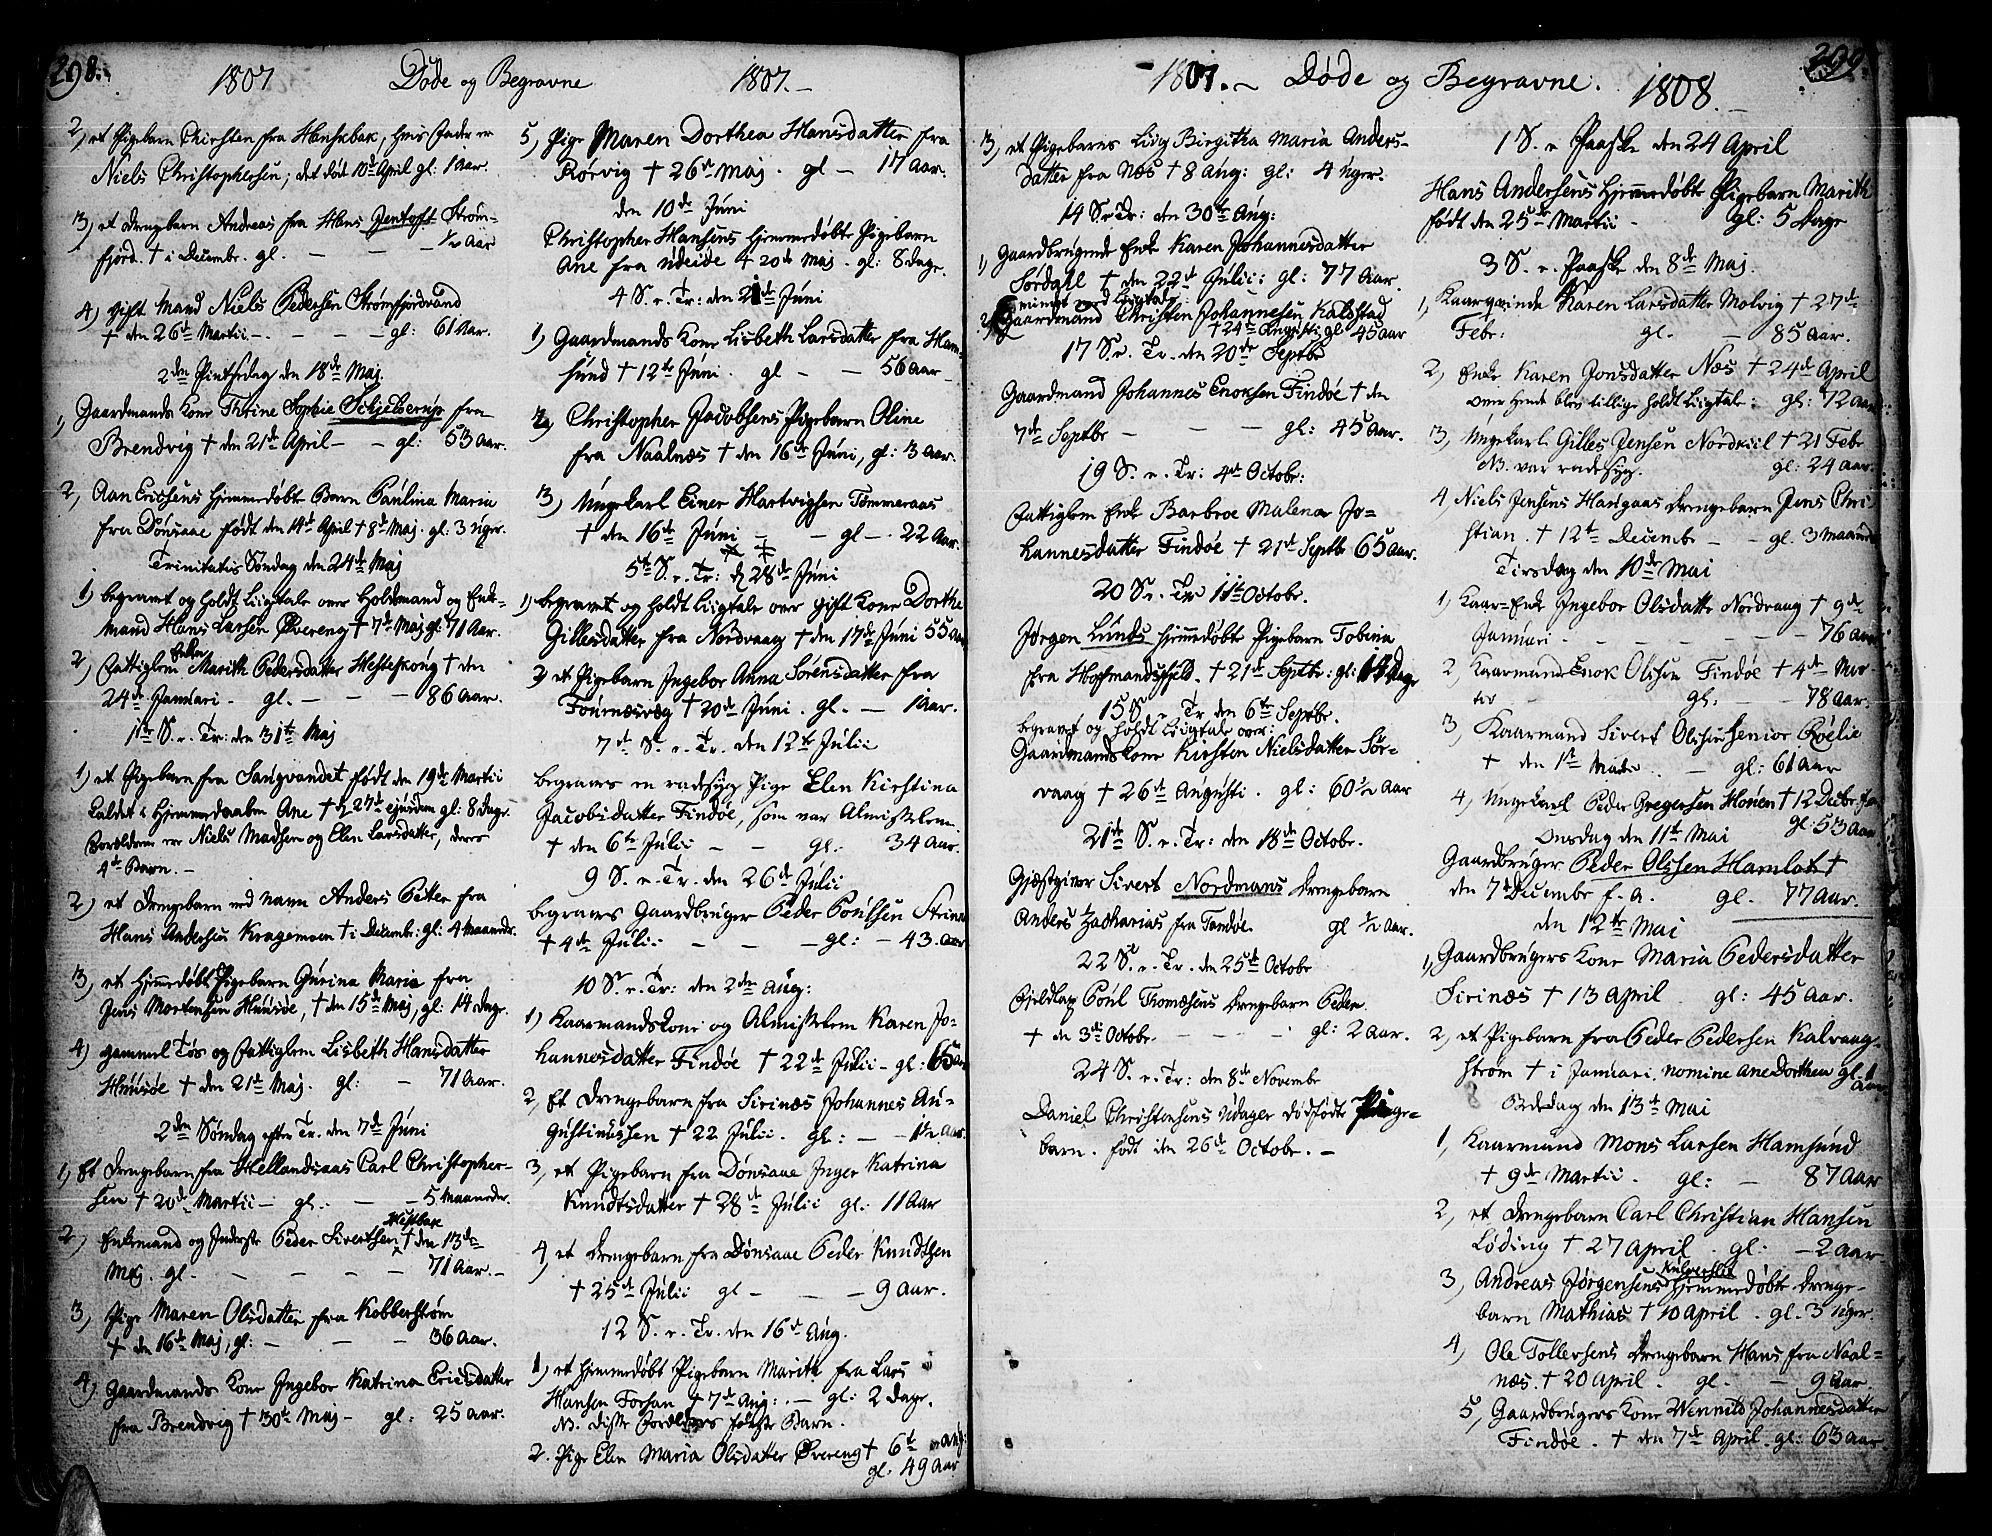 SAT, Ministerialprotokoller, klokkerbøker og fødselsregistre - Nordland, 859/L0841: Ministerialbok nr. 859A01, 1766-1821, s. 298-299